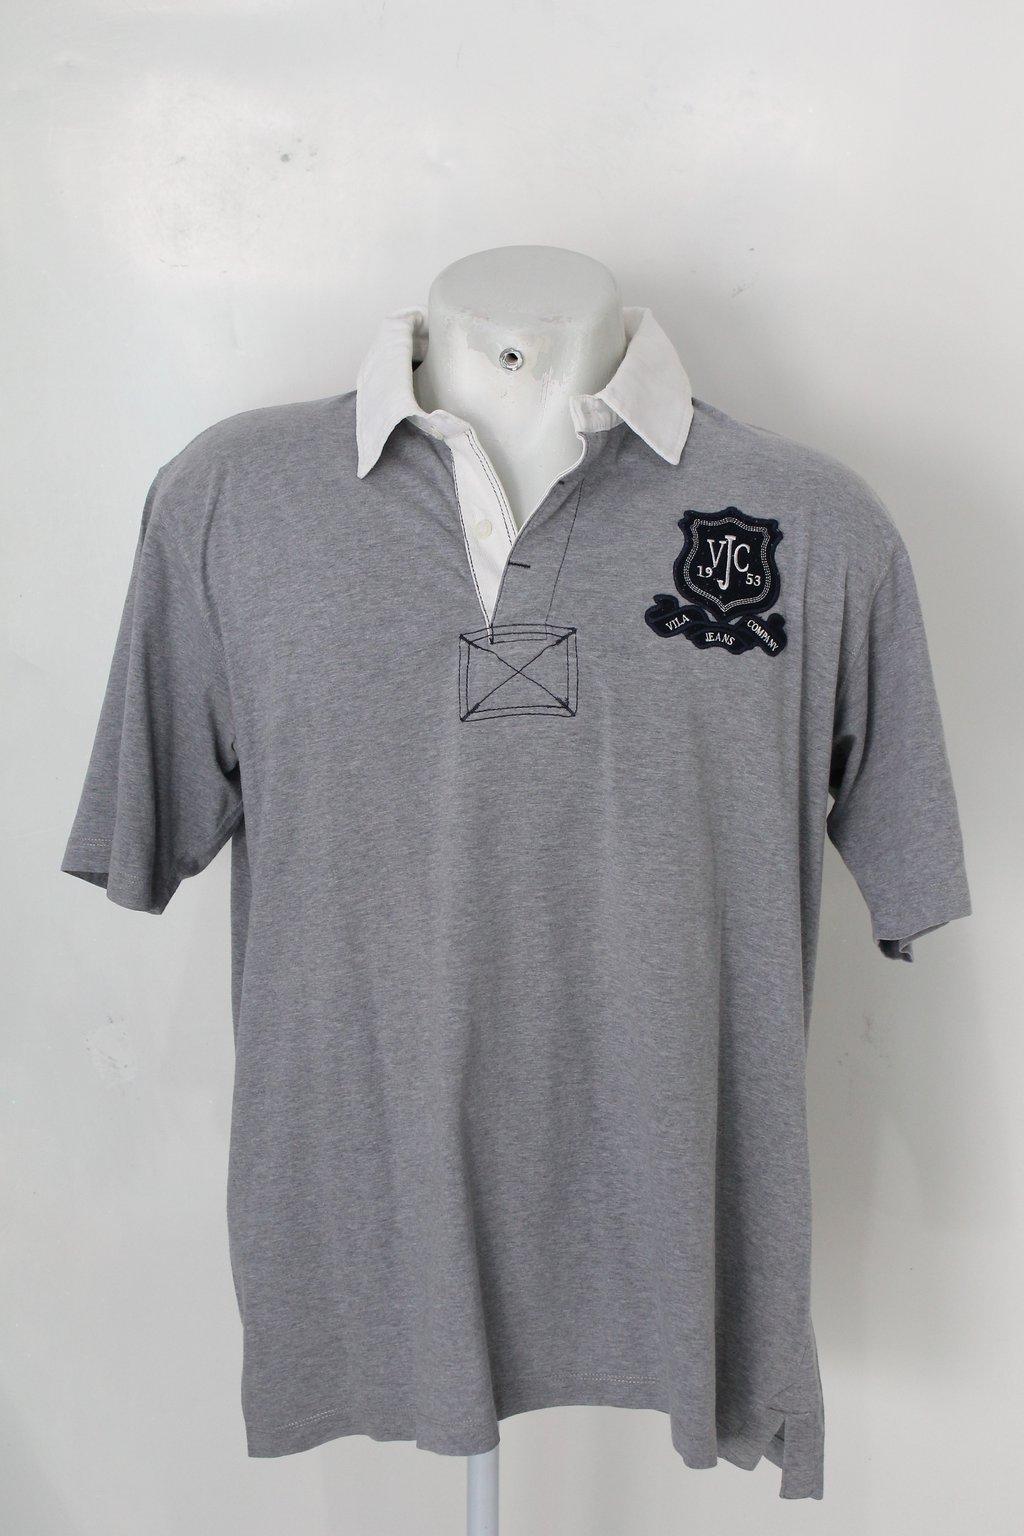 Camisa Polo V.j.c Masculina Cinza